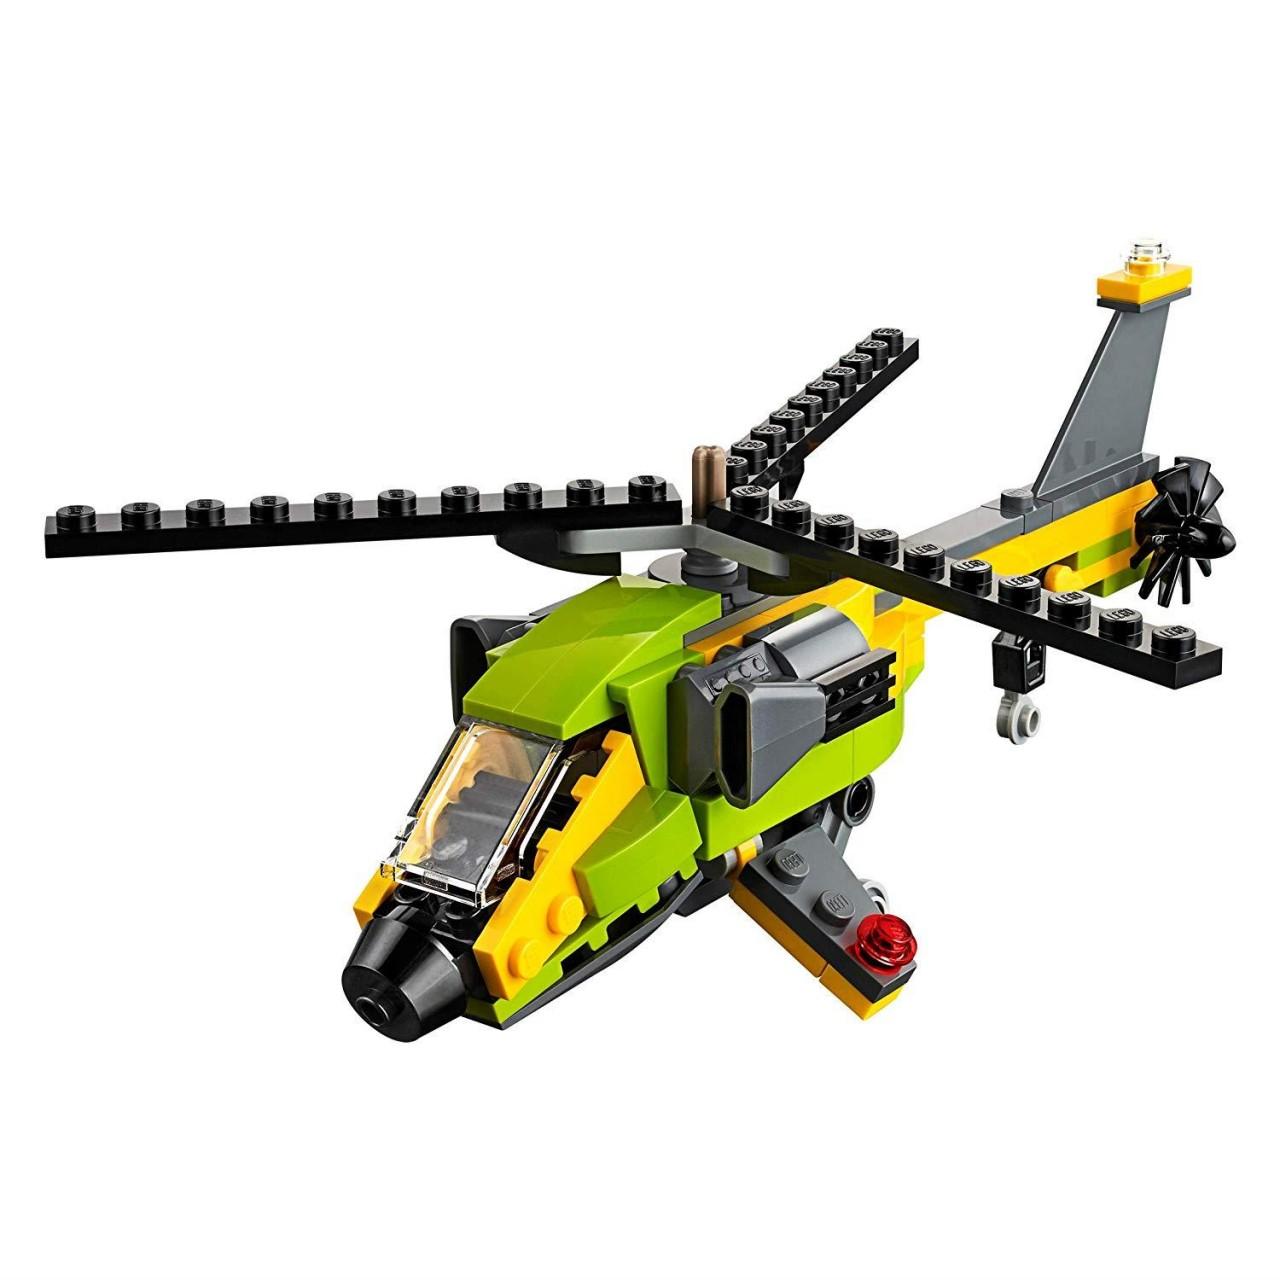 LEGO CREATOR 31092 Hubschrauber